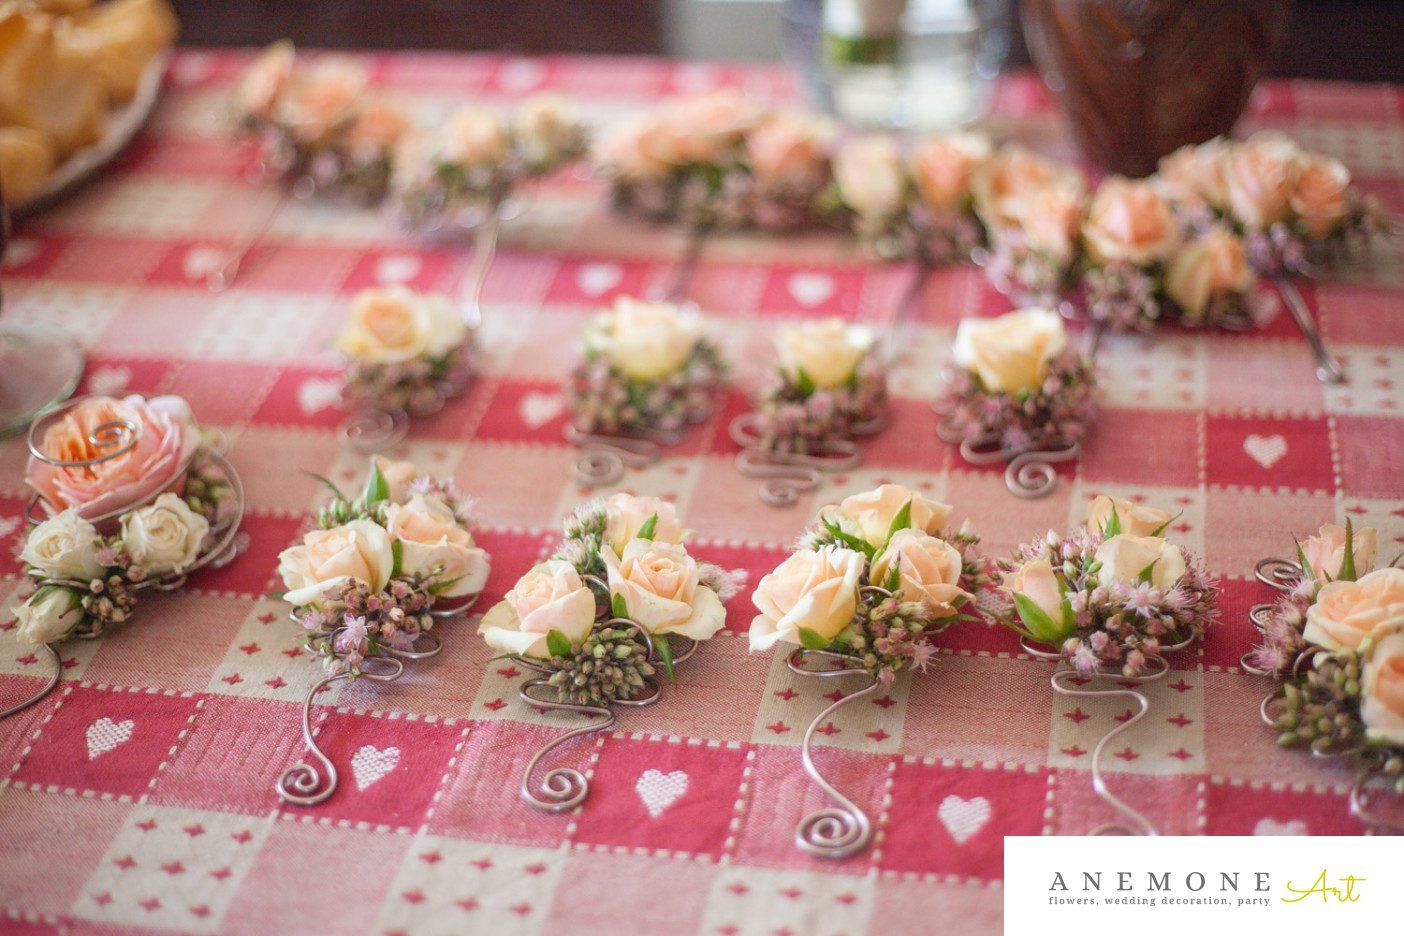 Poza, foto cu Flori de nunta cocarda, piersica in Arad, Timisoara, Oradea (wedding flowers, bouquets) nunta Arad, Timisoara, Oradea